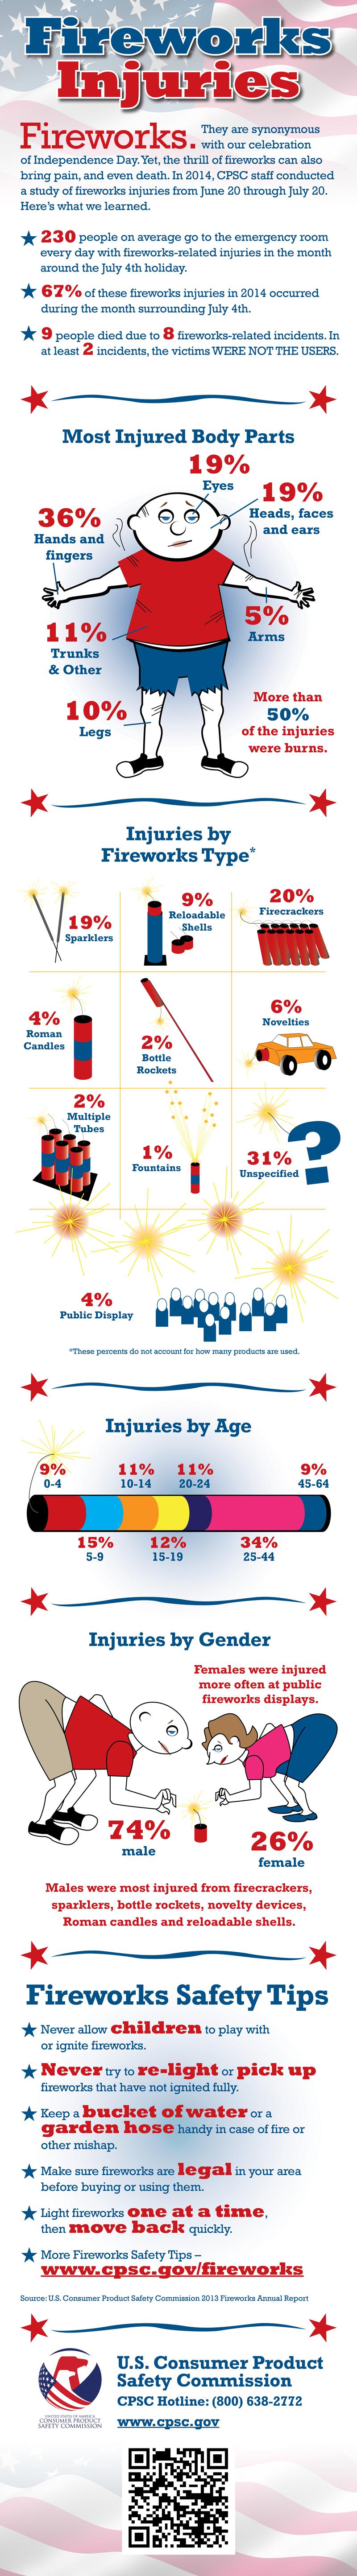 Fireworks Injuries 2015